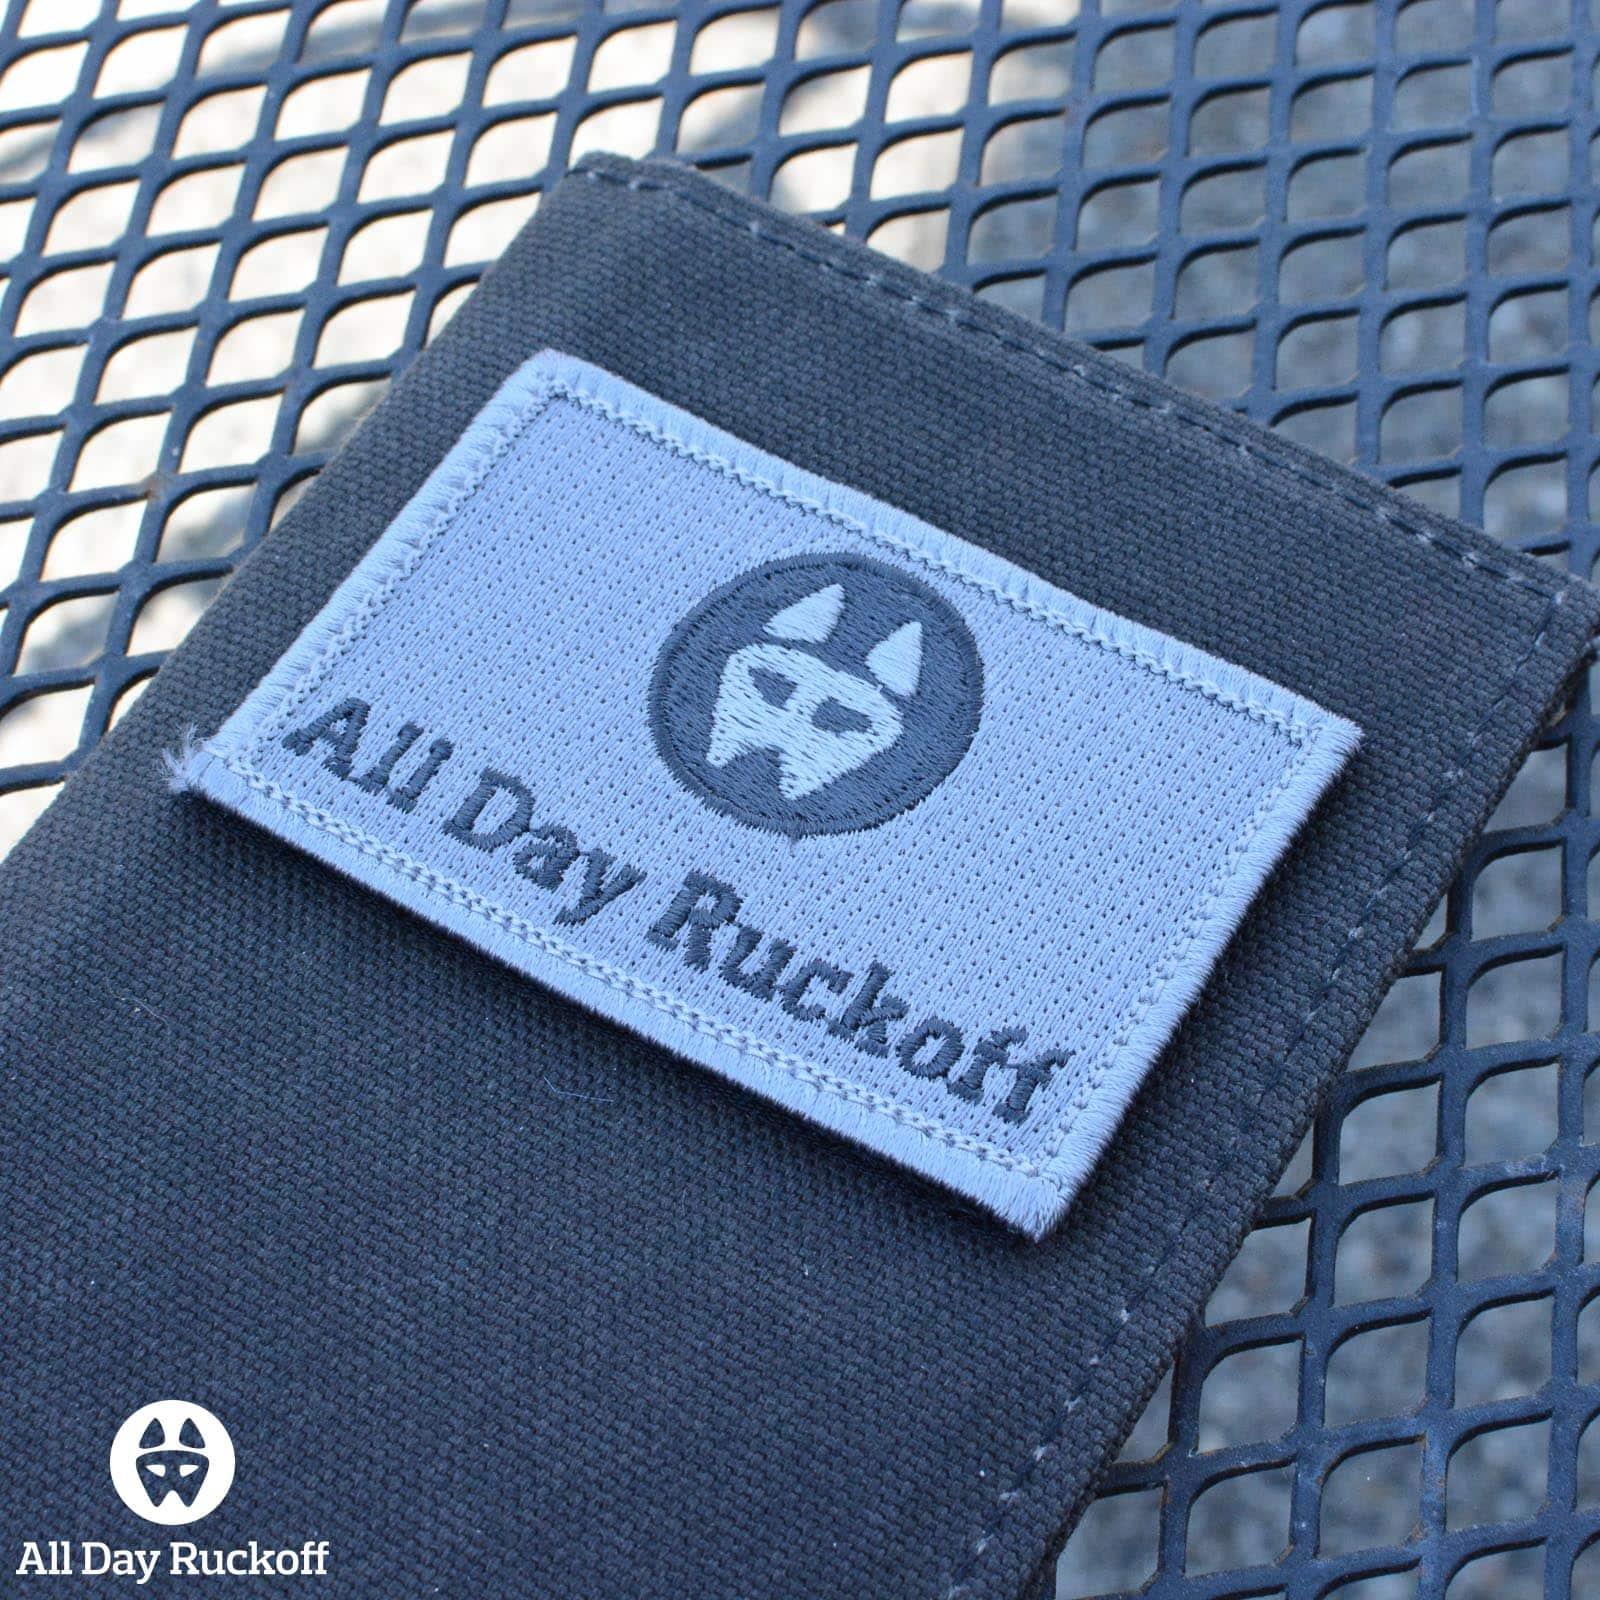 ADR Dog Logo Rectangle Patch - Gray Side